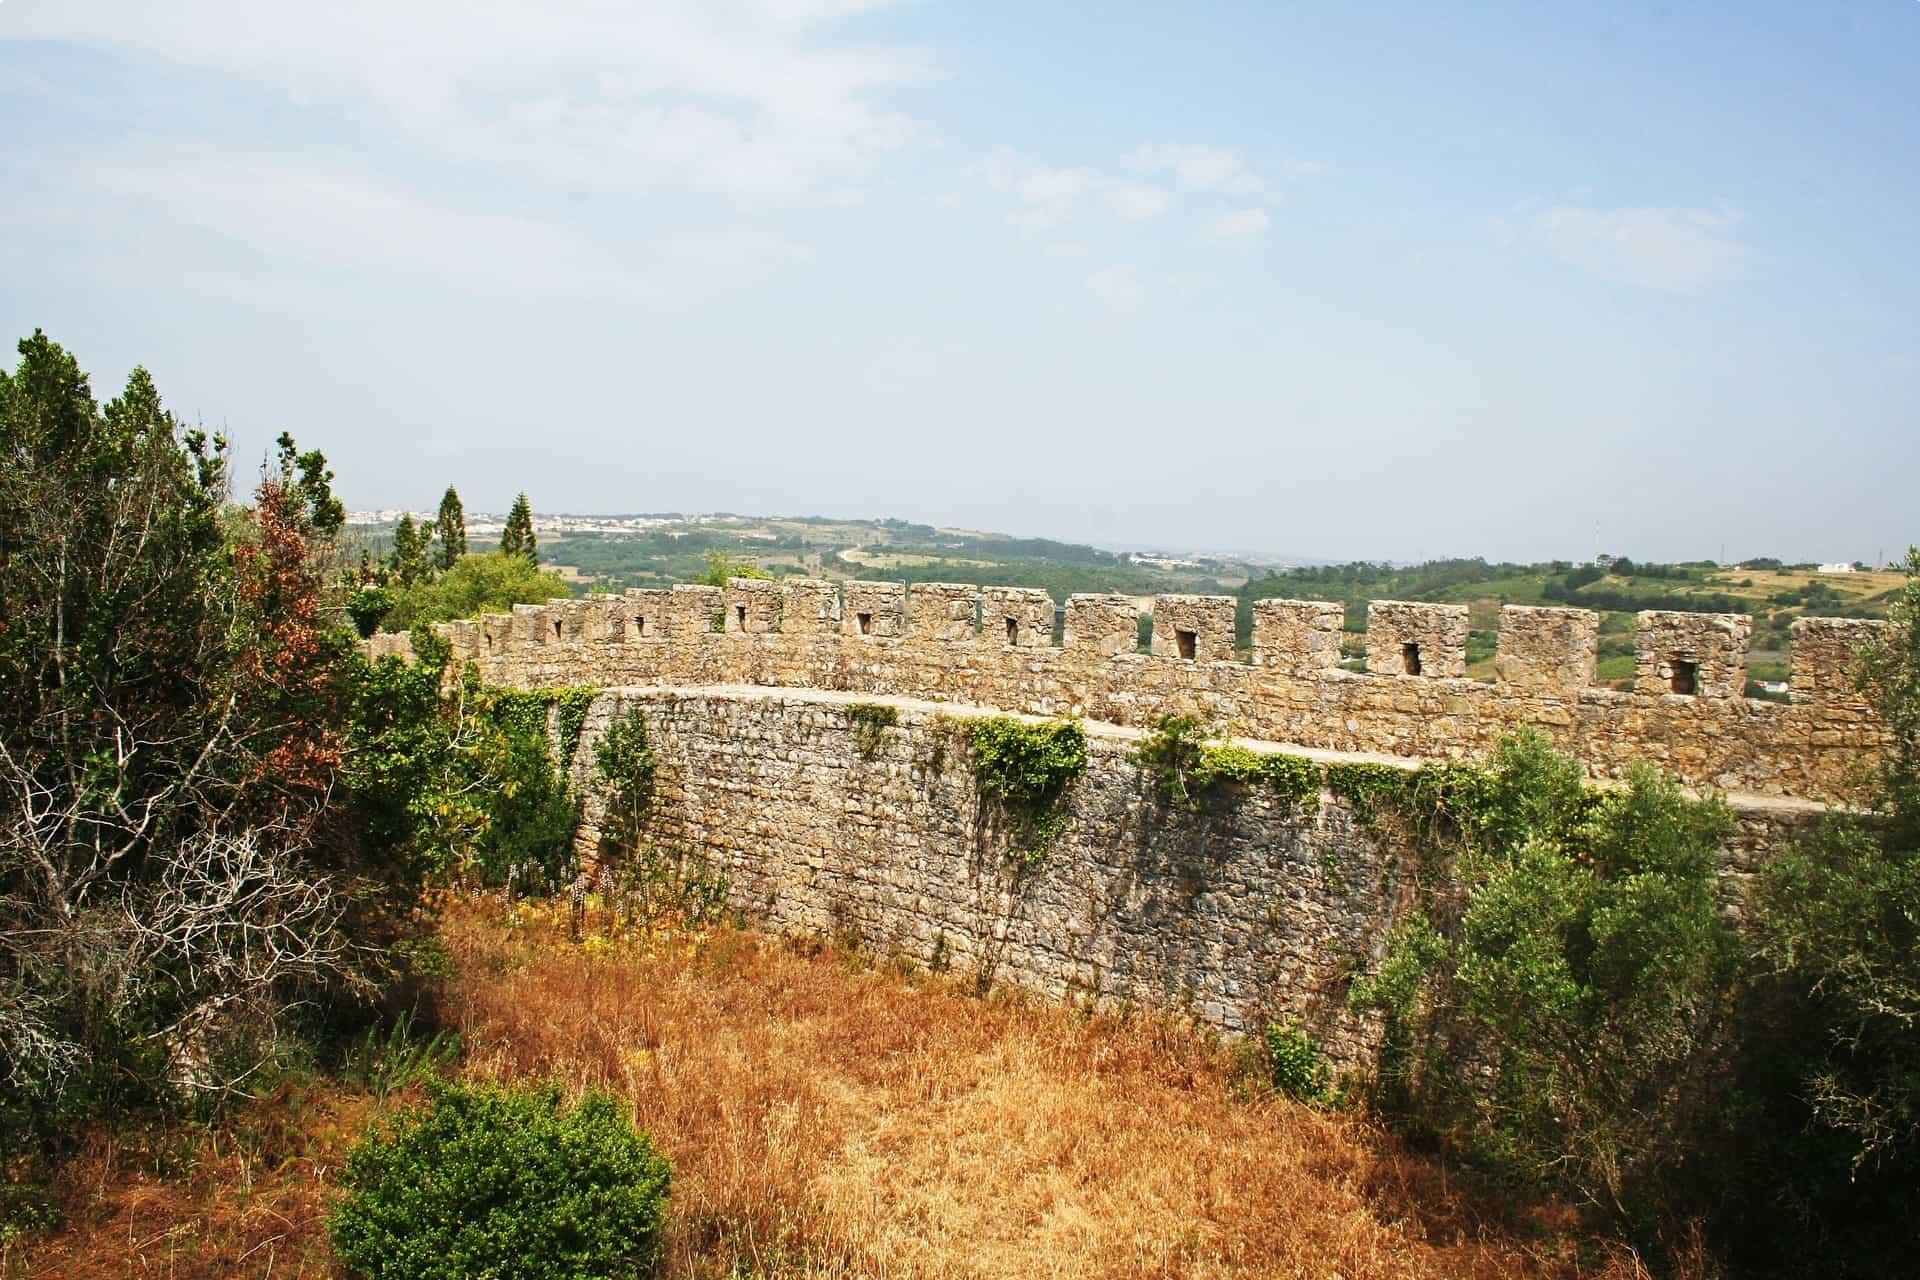 The walkable city walls